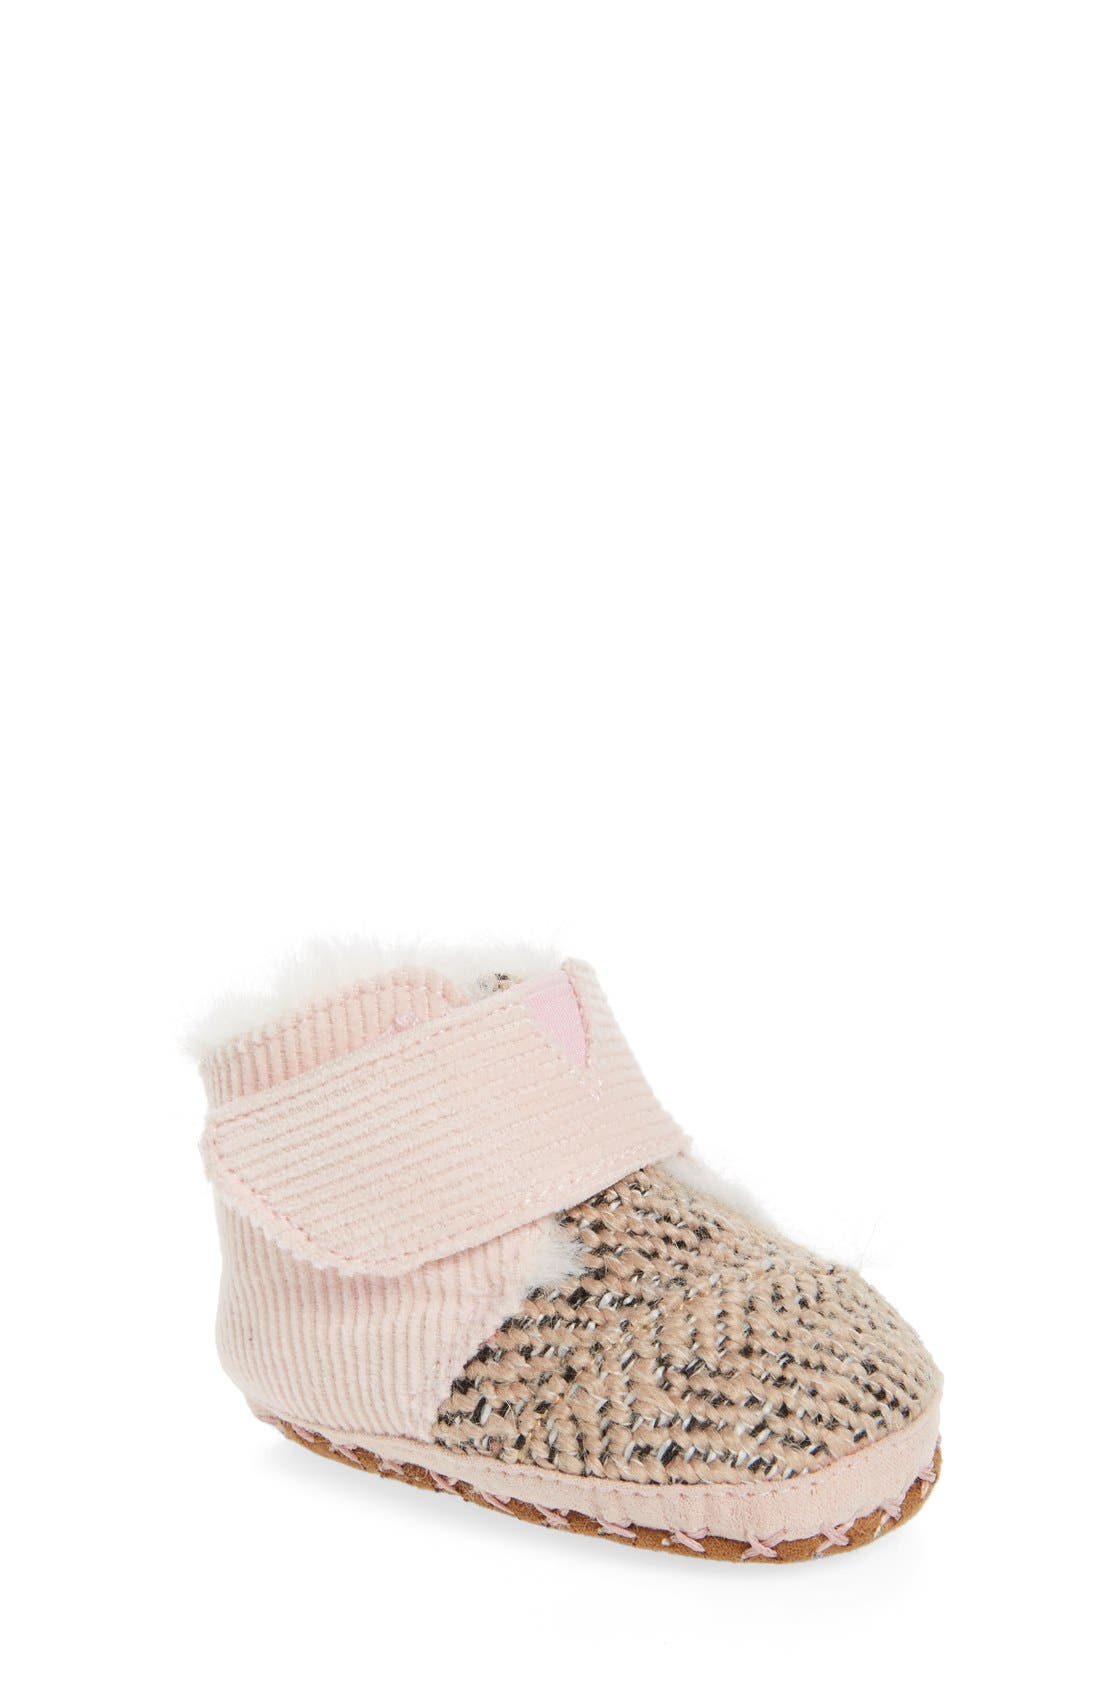 Cuna Crib Shoe,                         Main,                         color, PINK